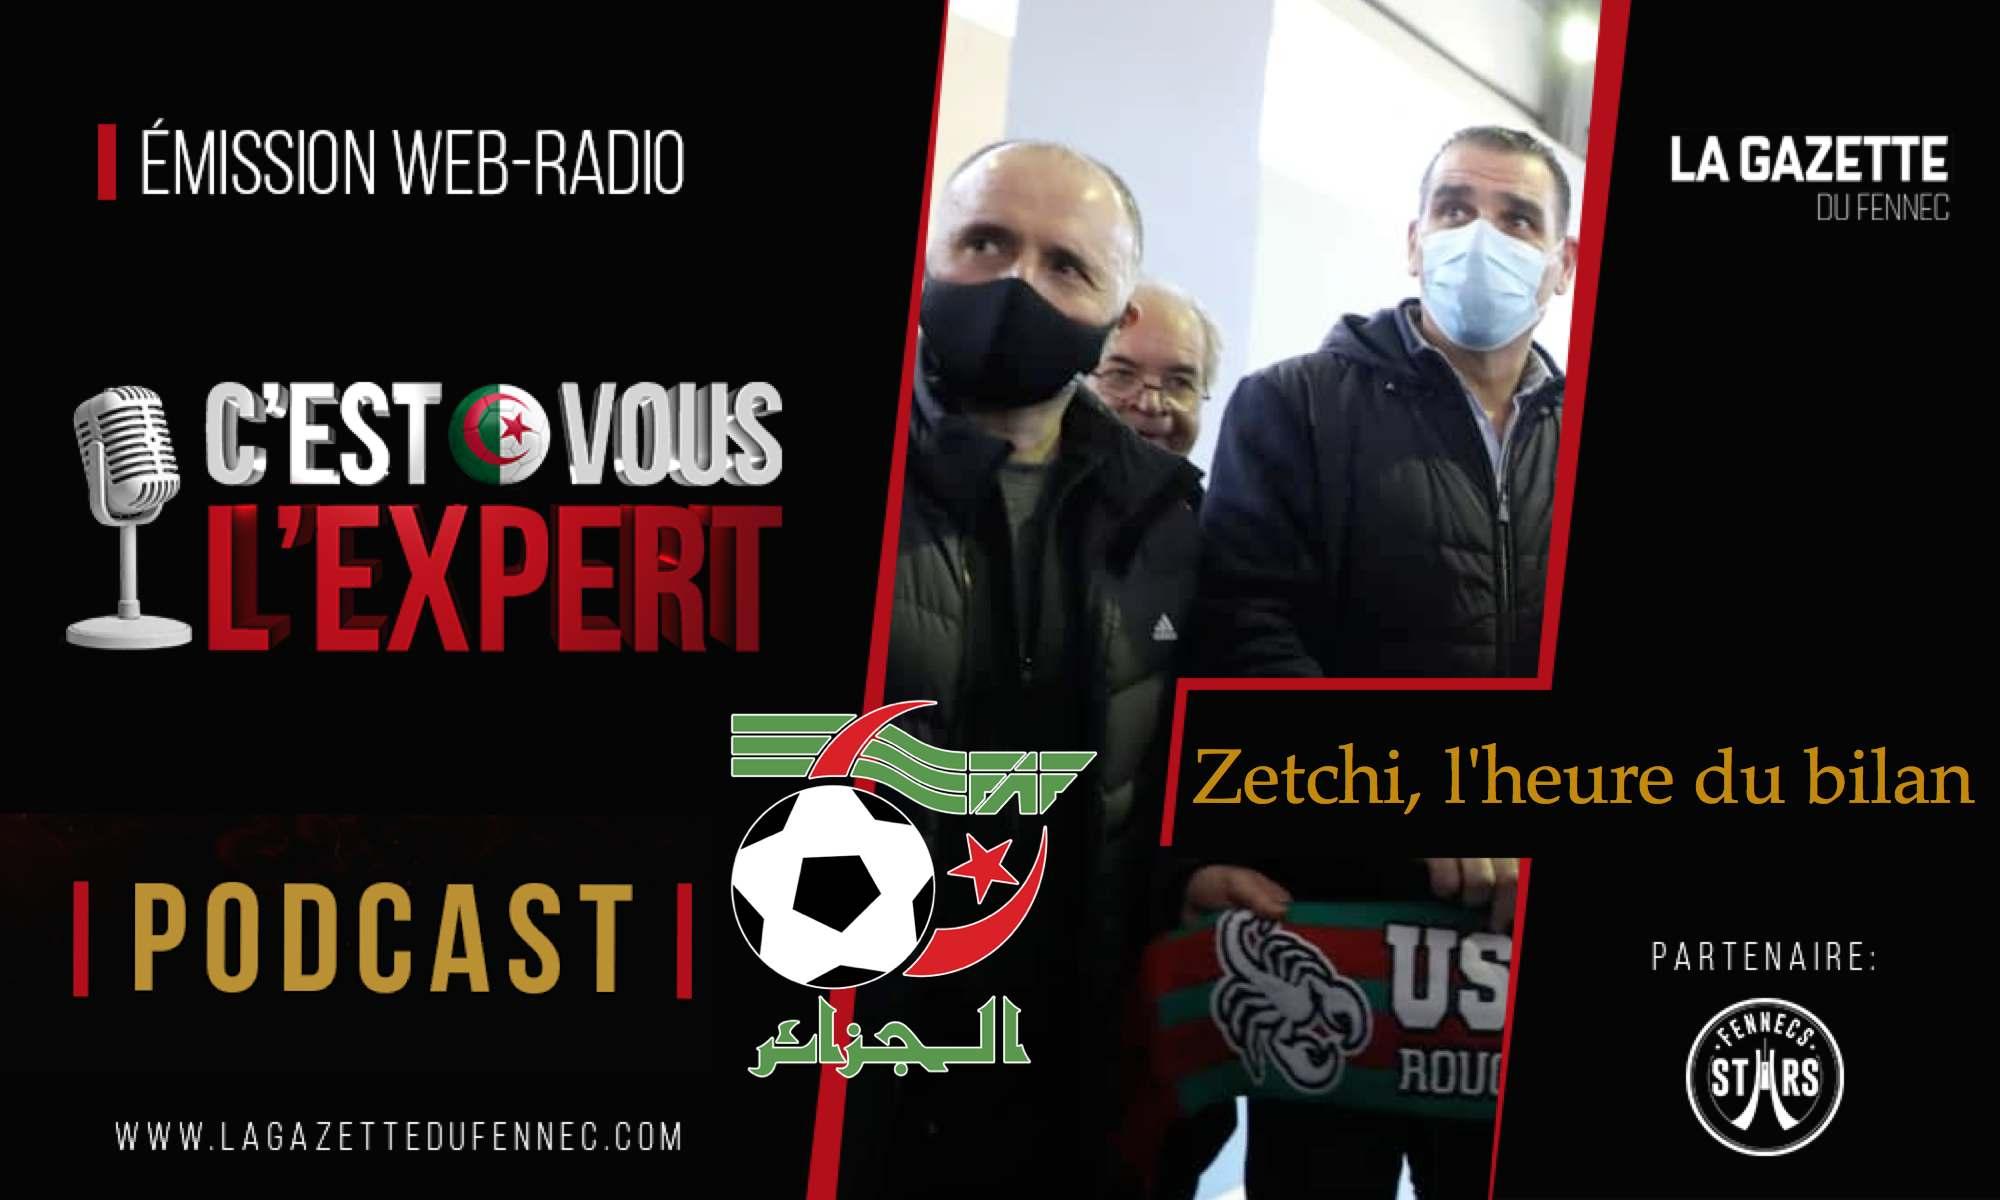 zetchi podcast bilan